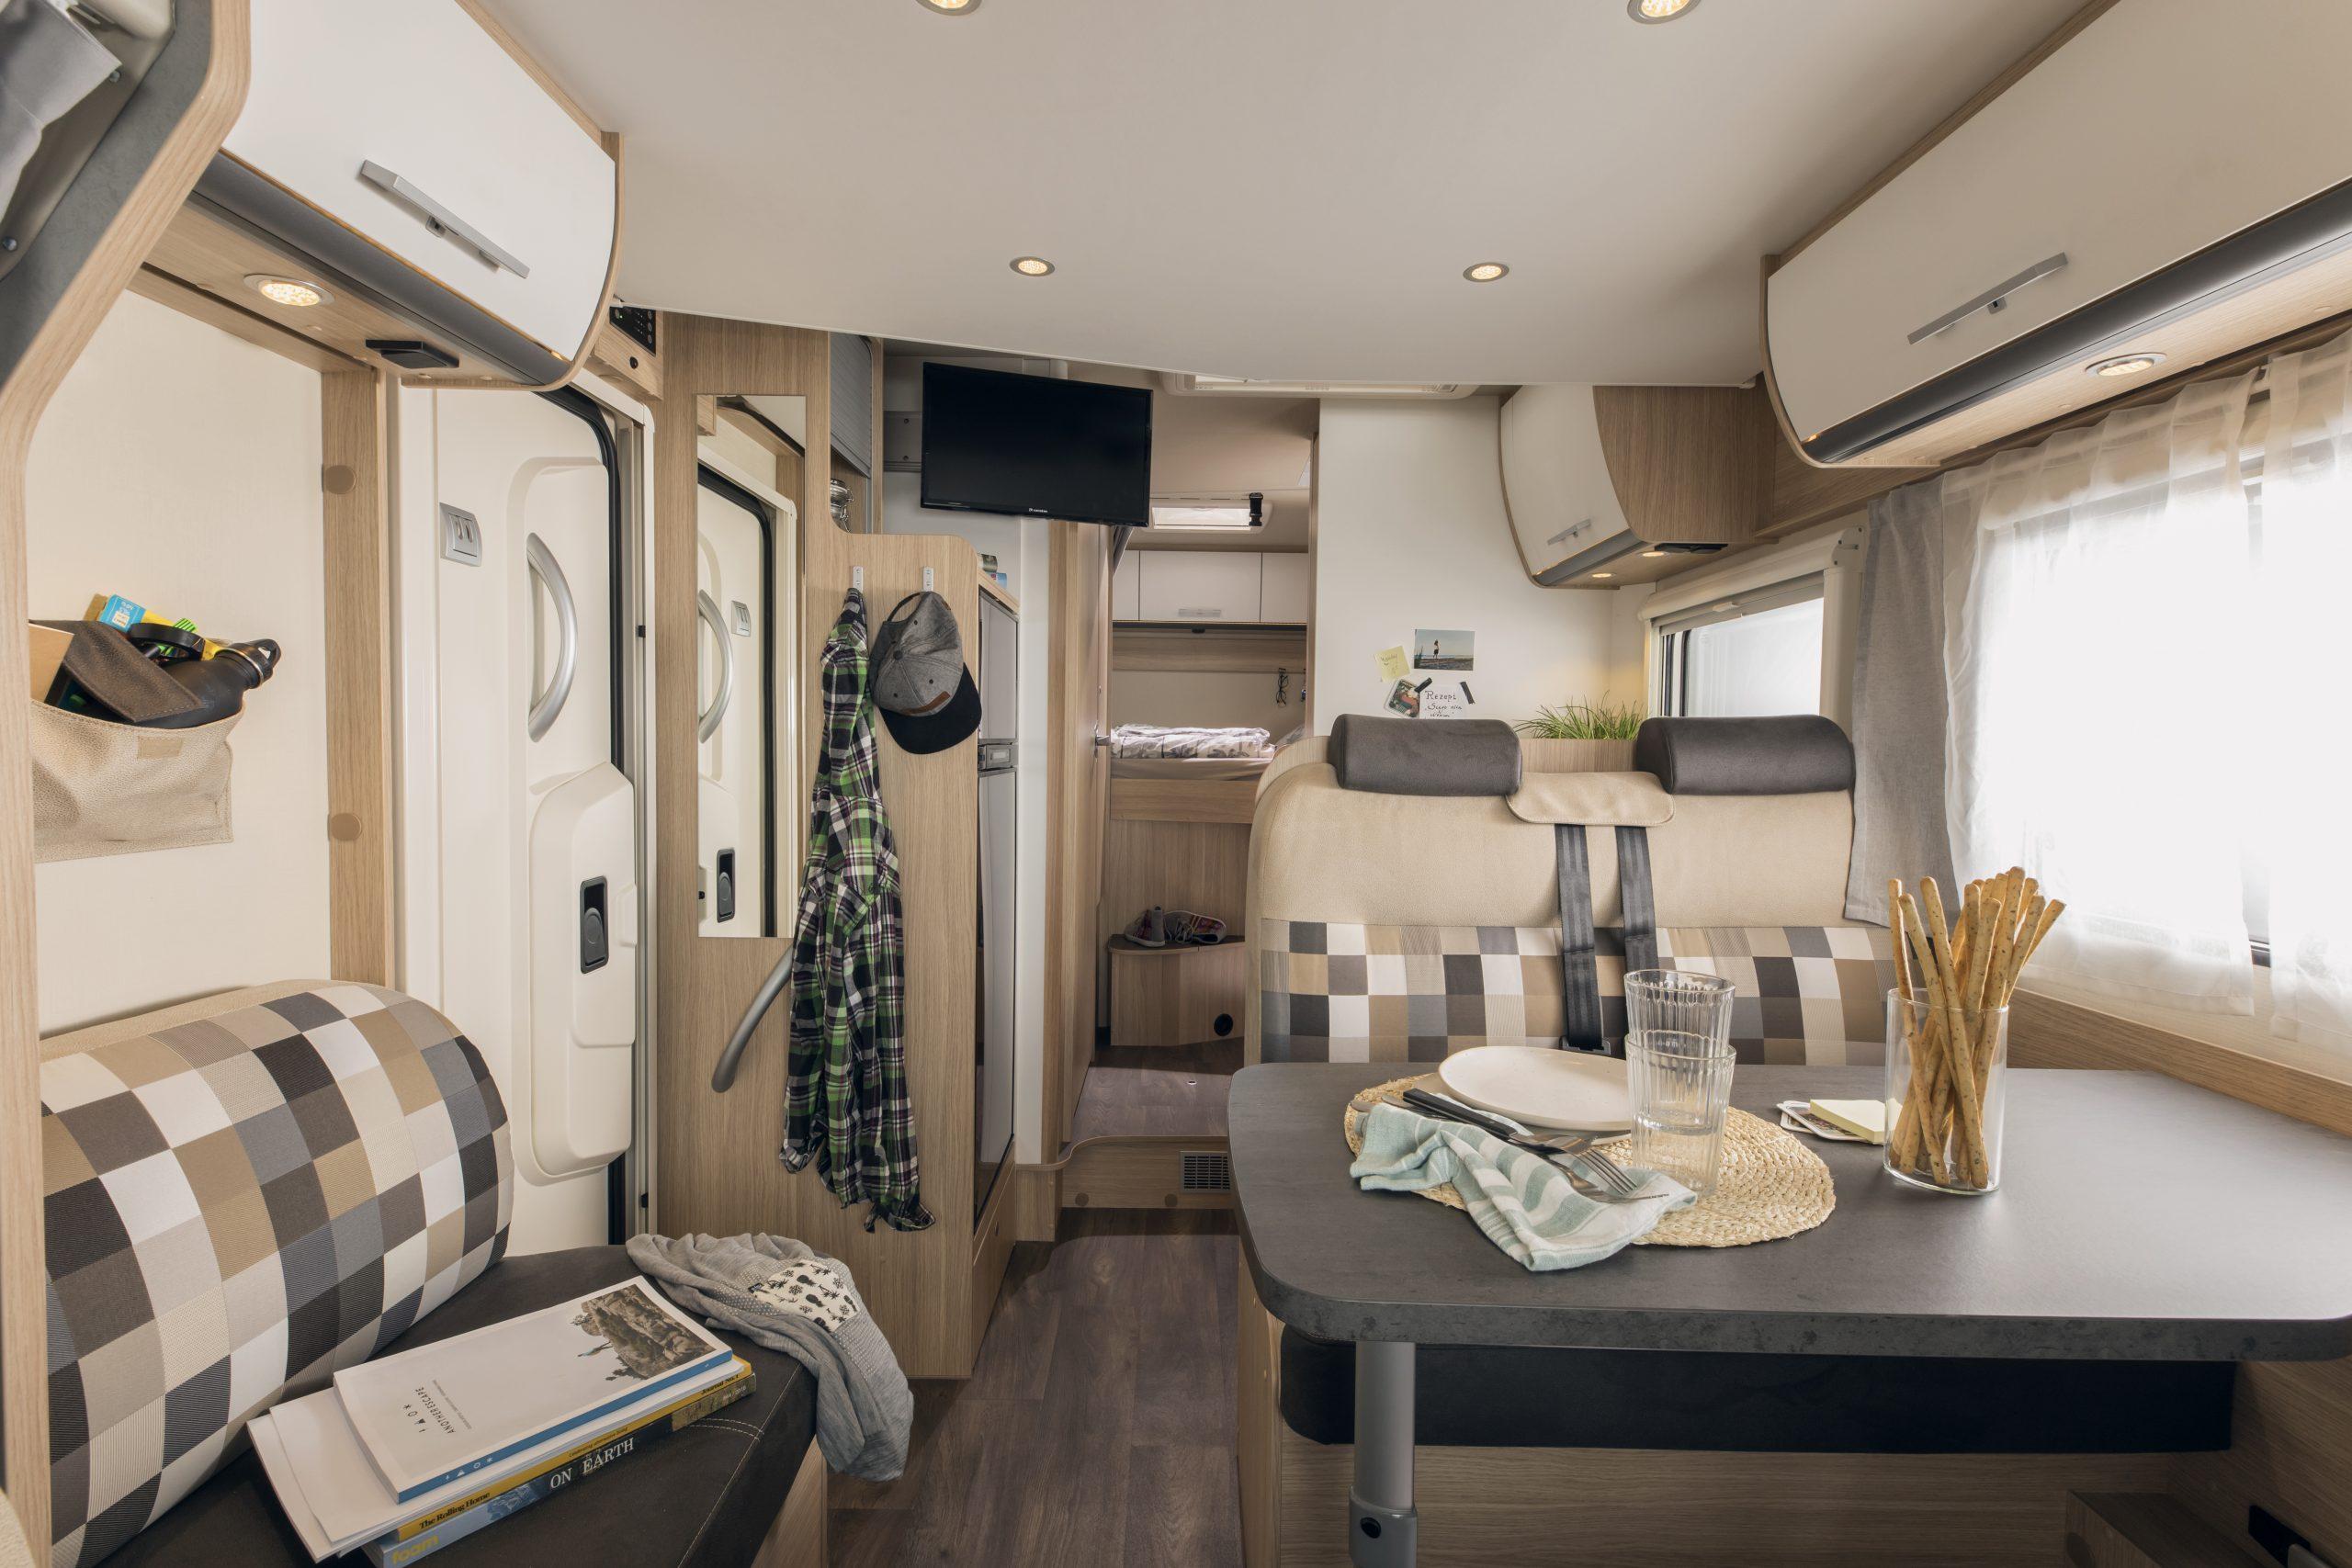 McRent Comfort Luxury interiør